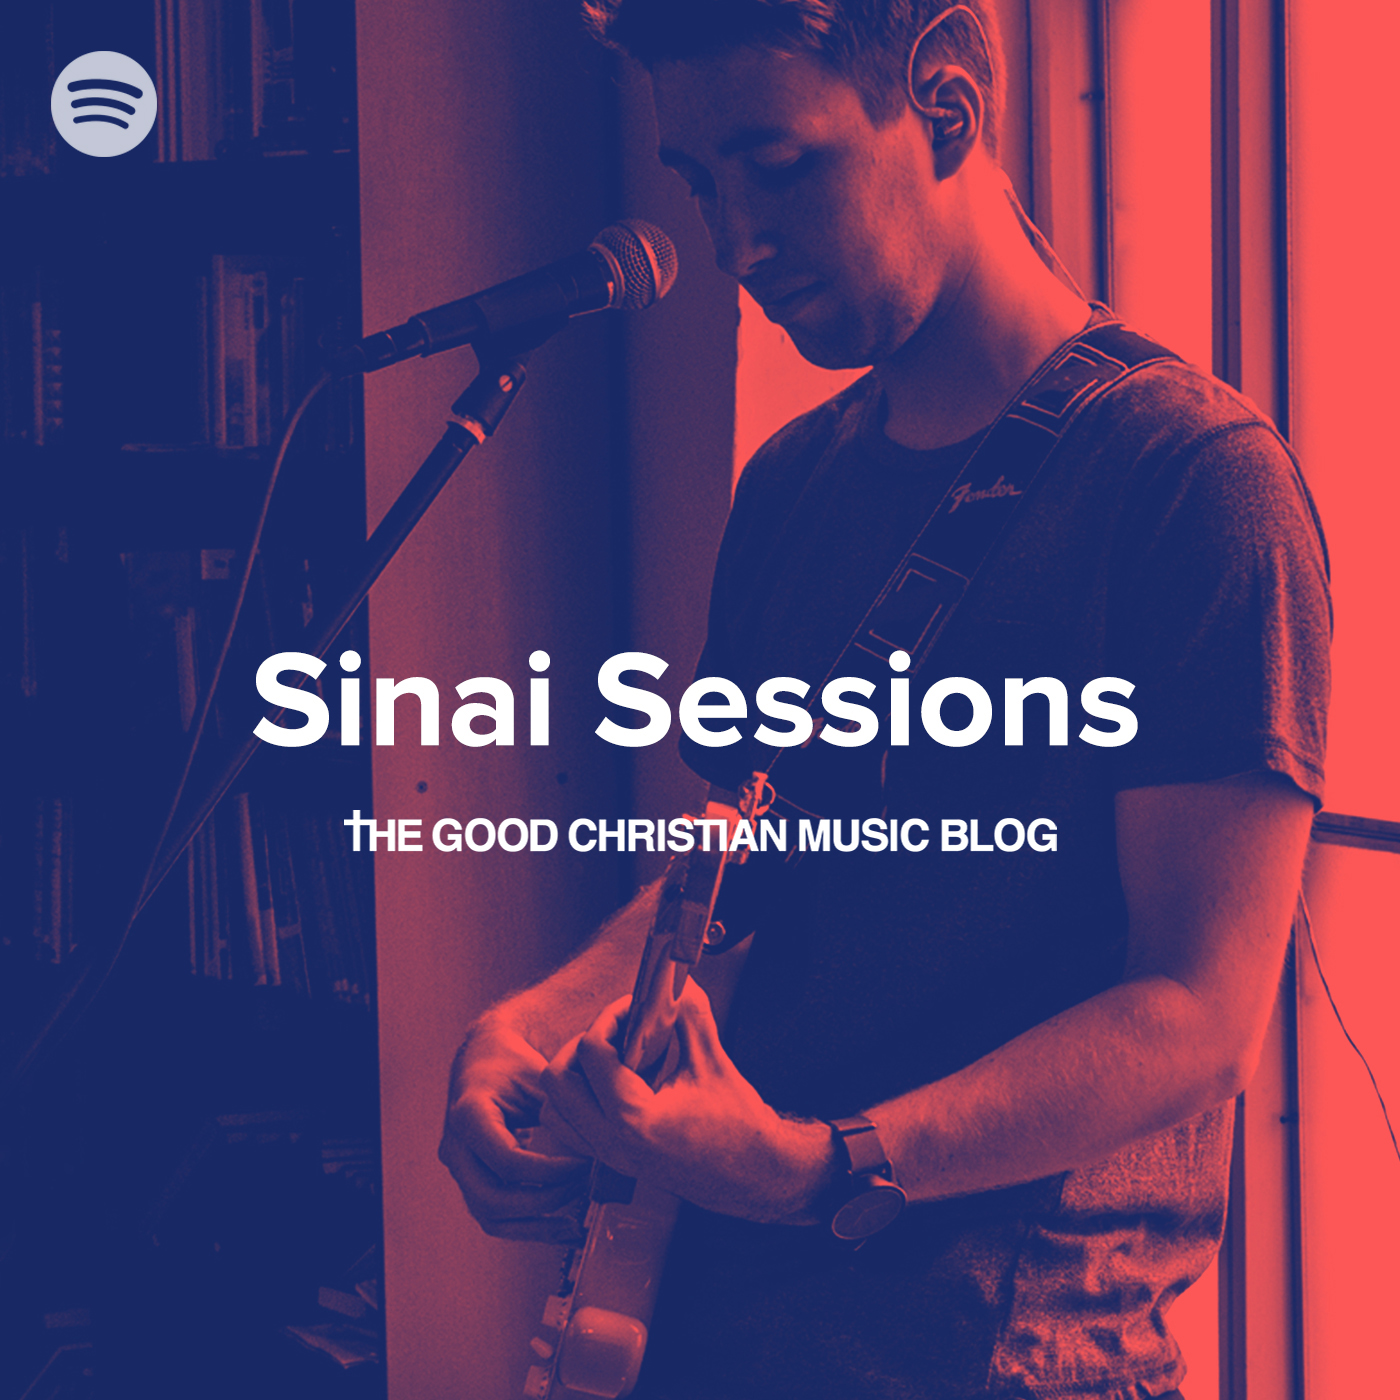 Sinai Sessions Spotify Playlist Artwork.jpg